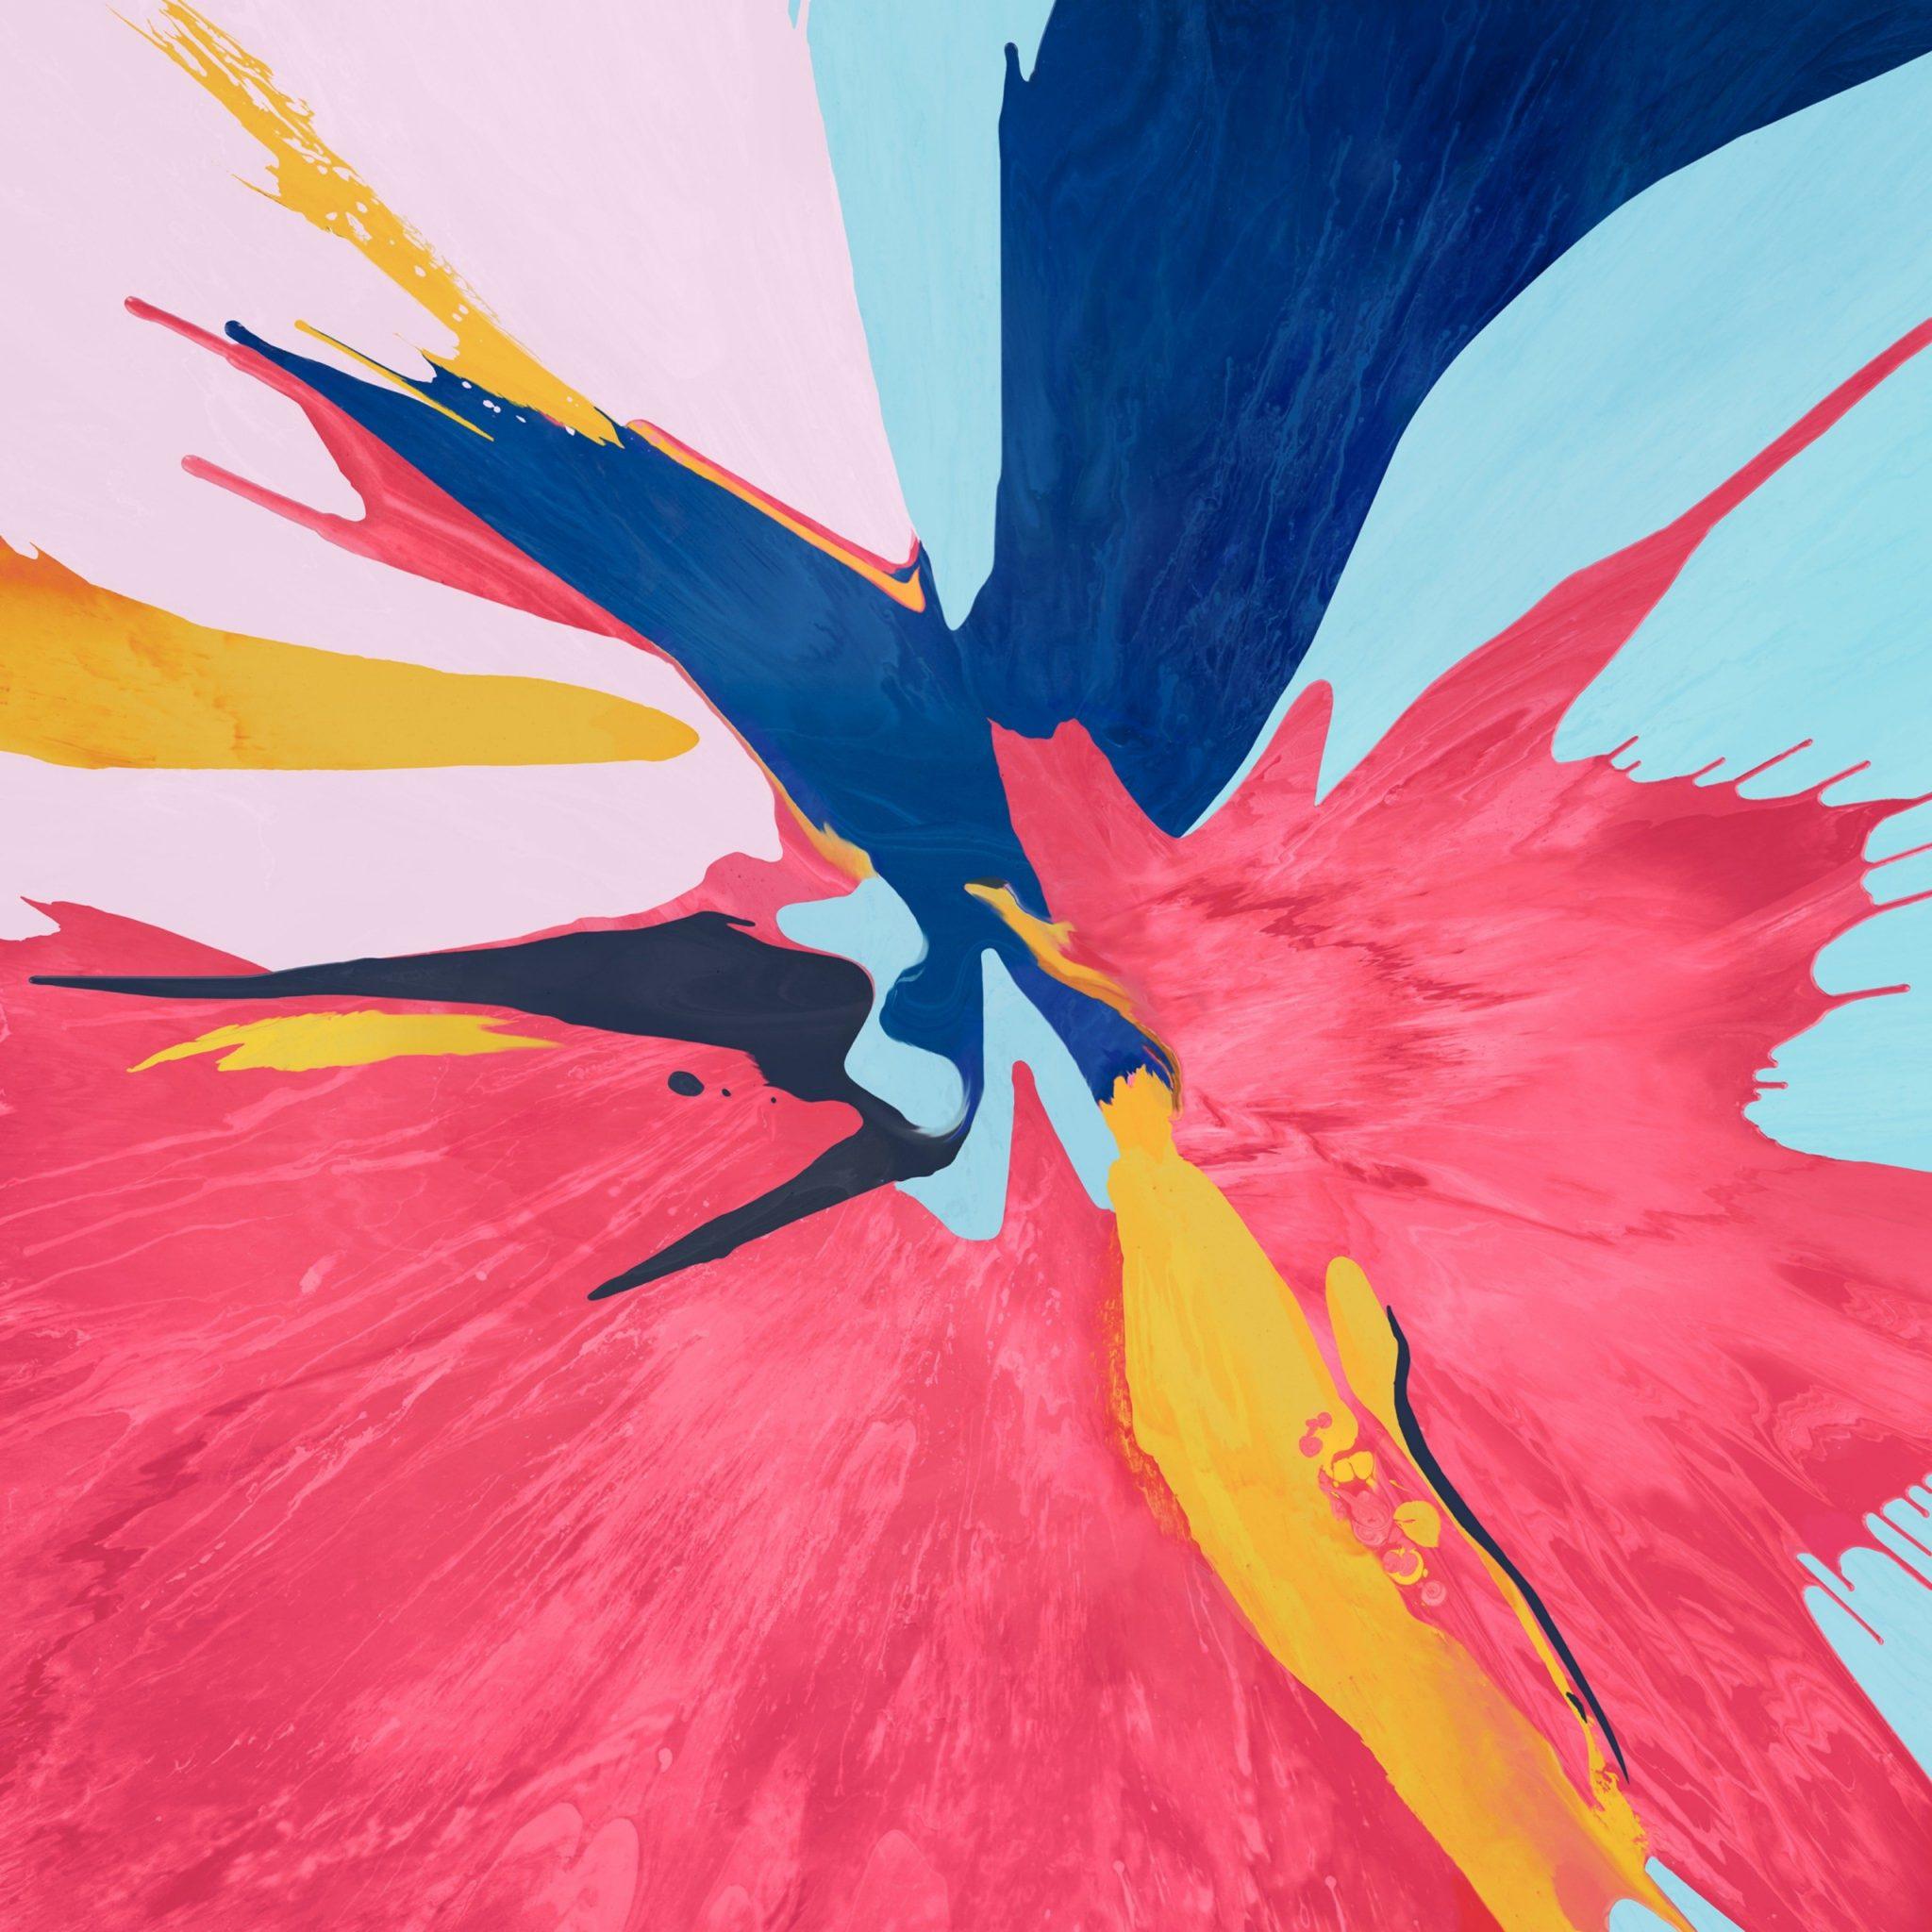 2048x2048 wallpapers iPad retina Spalsh Pink Yellow Blue Ipad Wallpaper 2048x2048 pixels resolution